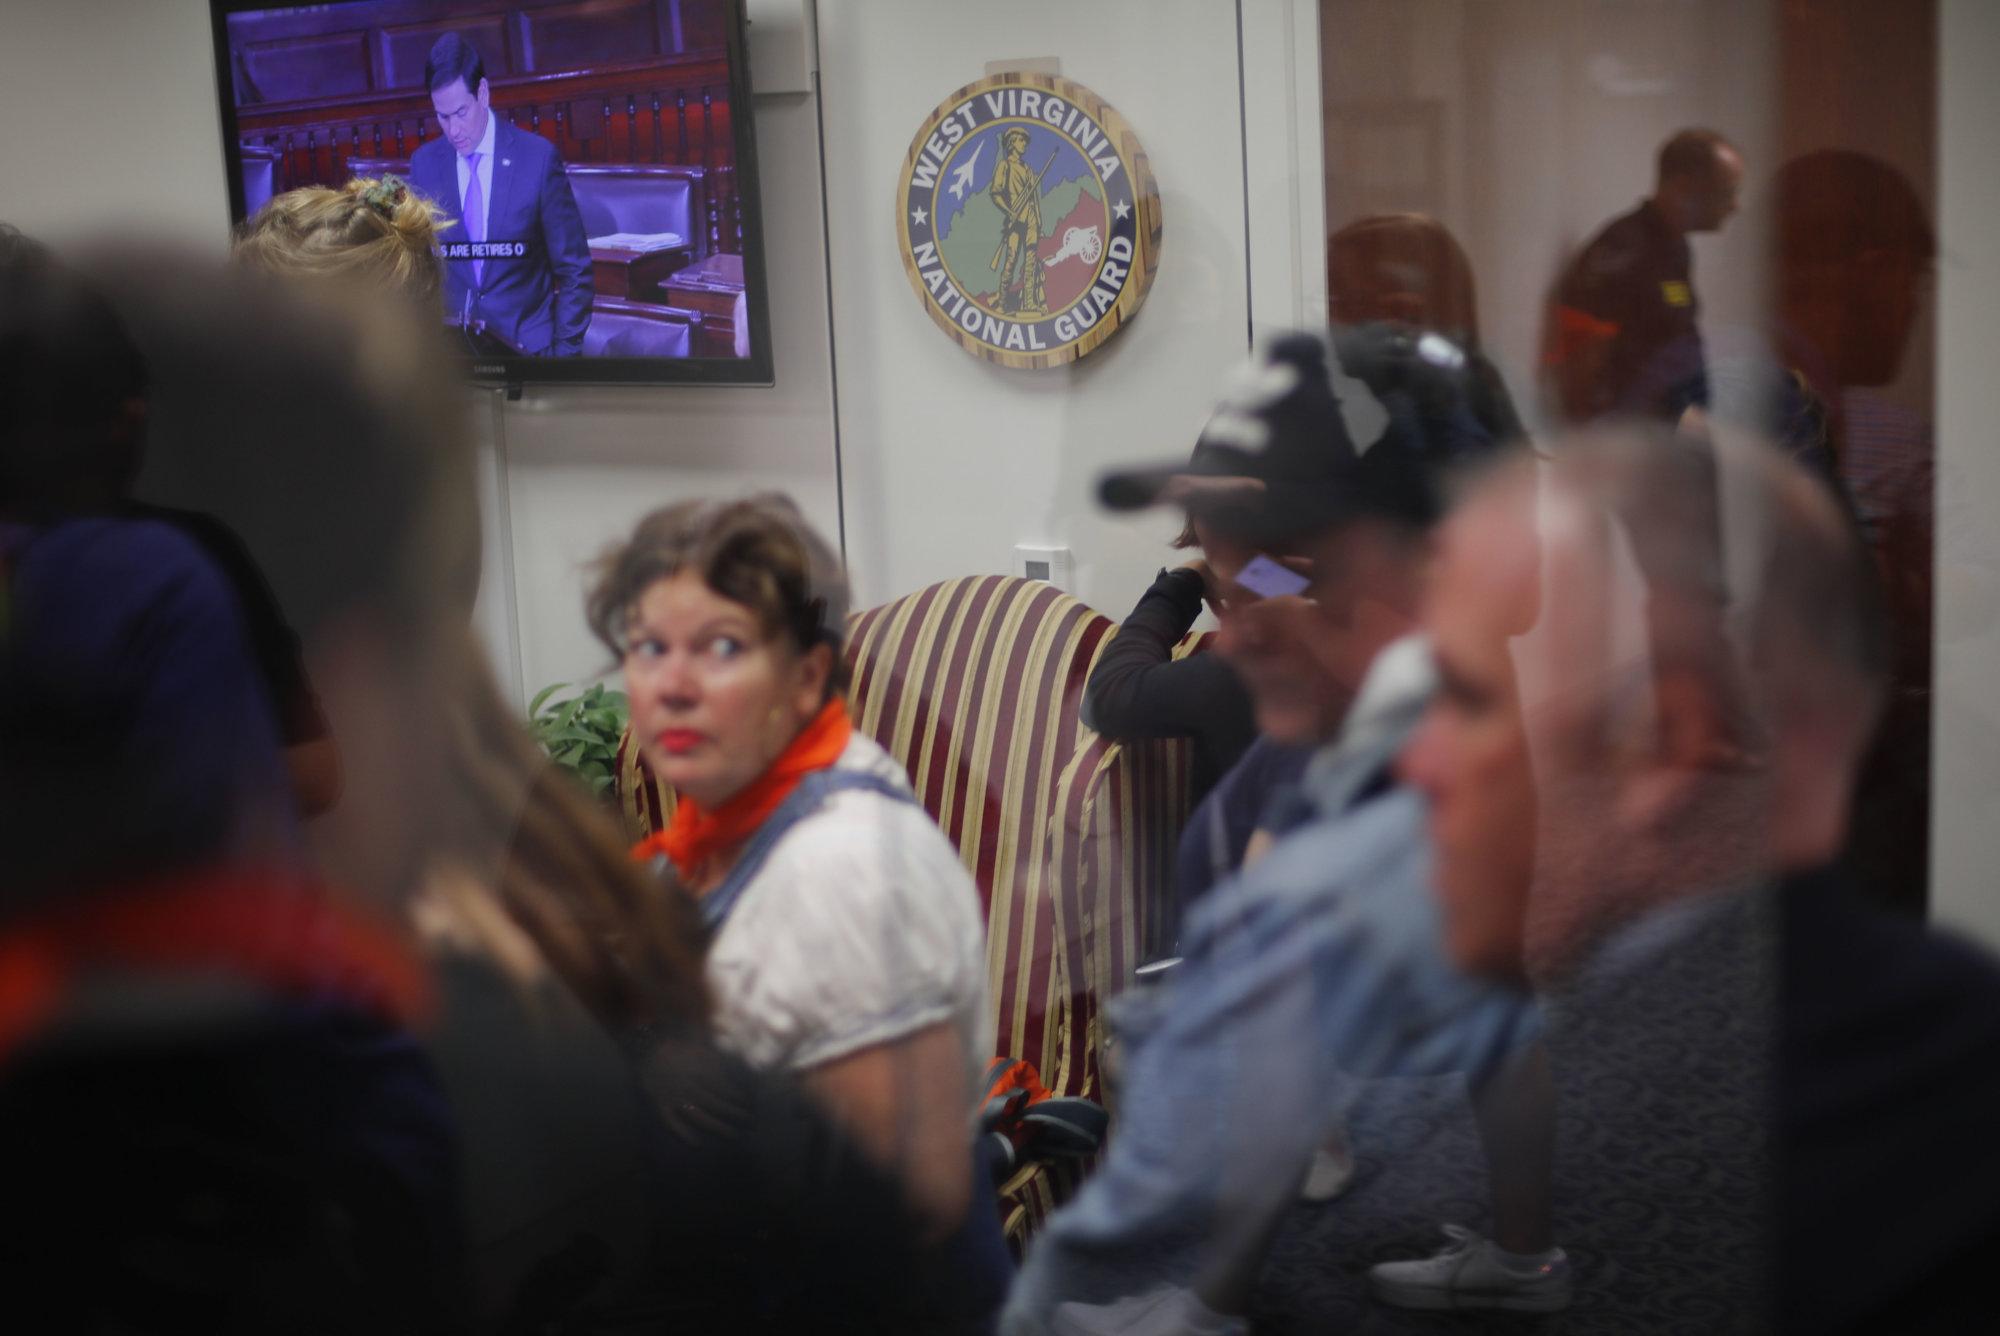 Demonstrators fill up the lobby entrance of Sen. Joe Manchin's, D-W.Va., Senate Office on Capitol Hill in Washington, Friday, Oct. 4, 2018. (AP Photo/Pablo Martinez Monsivais)